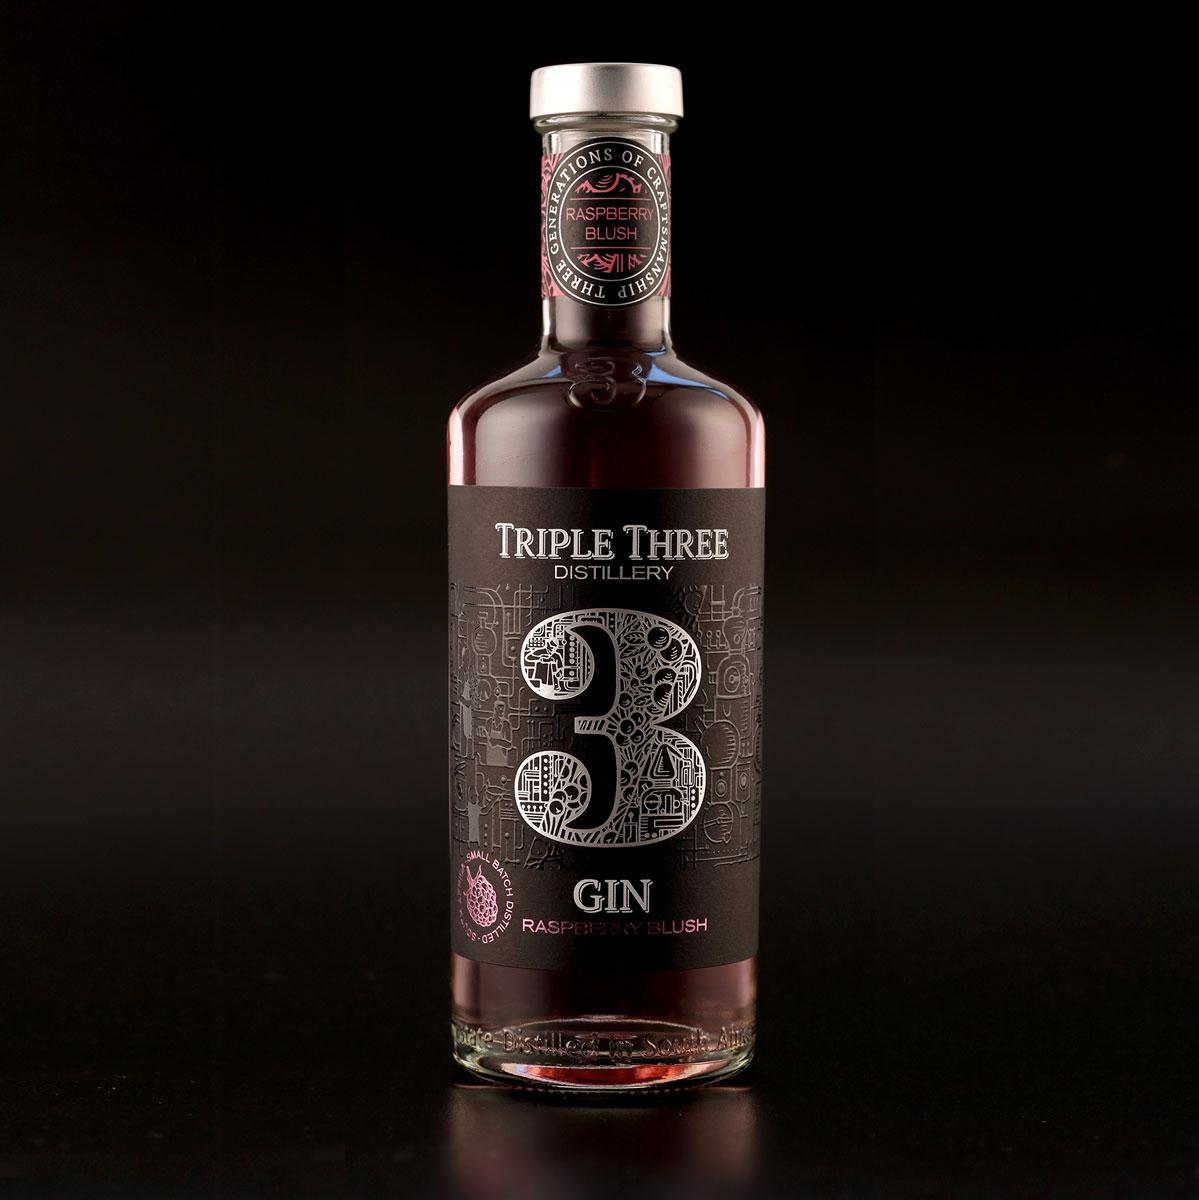 Triple 3 Raspberry Blush Gin